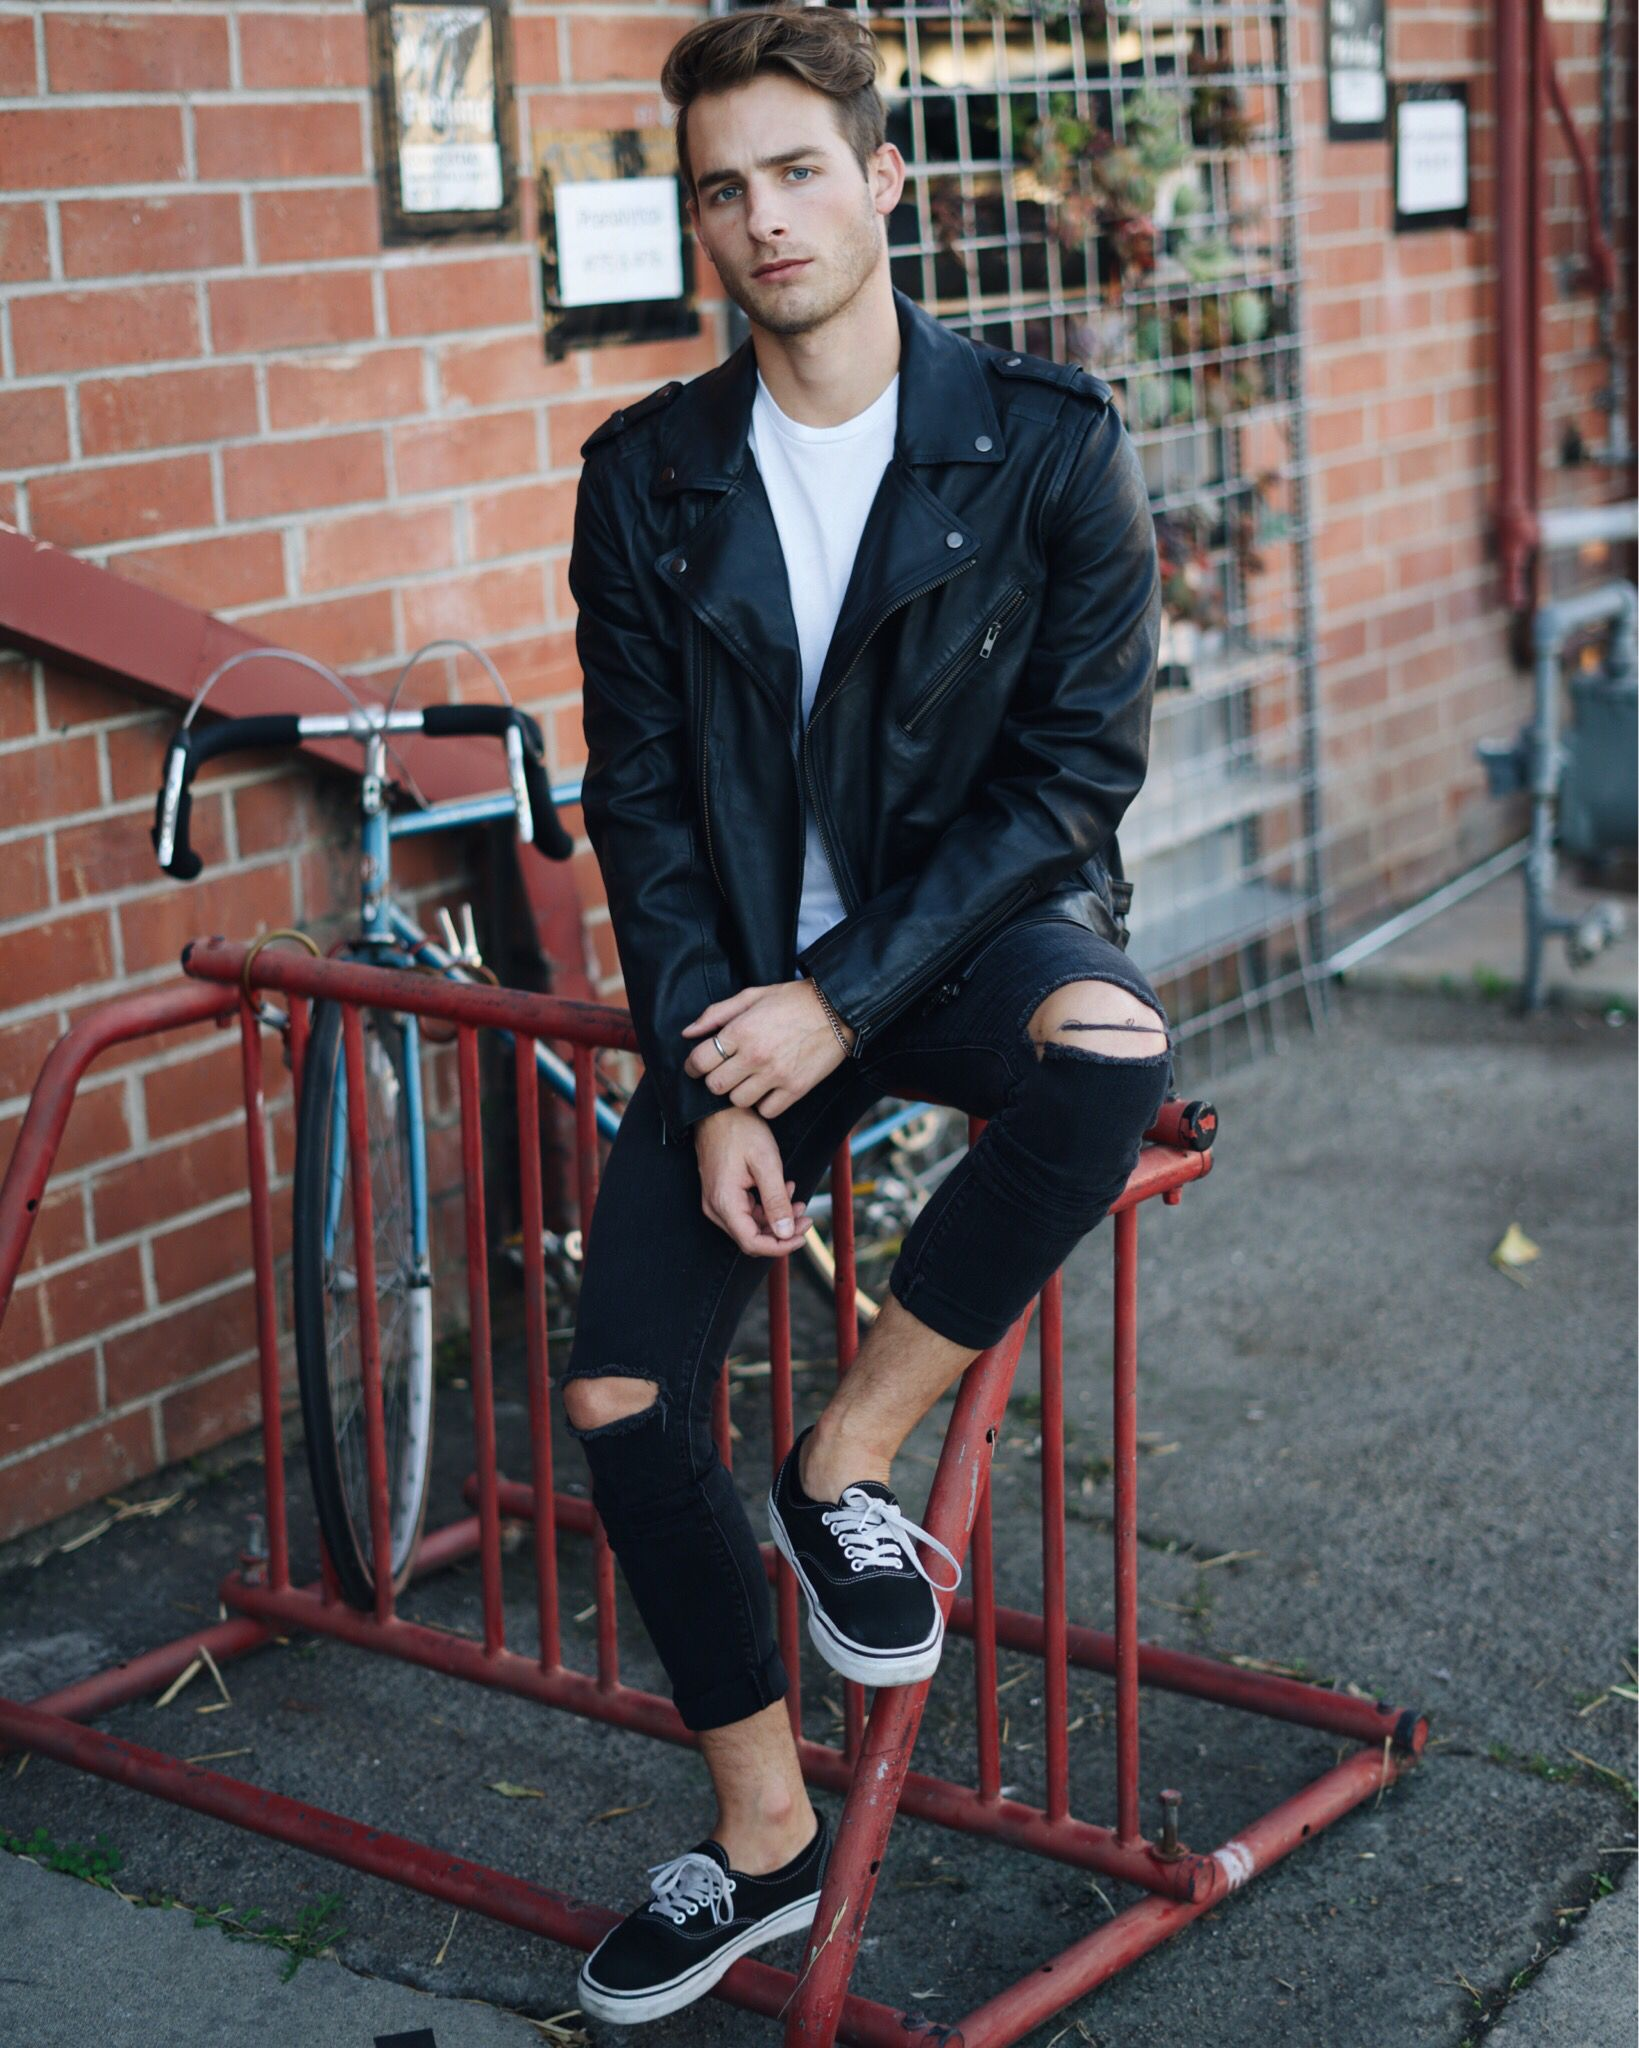 Denim Style Men Black Leather Jacket